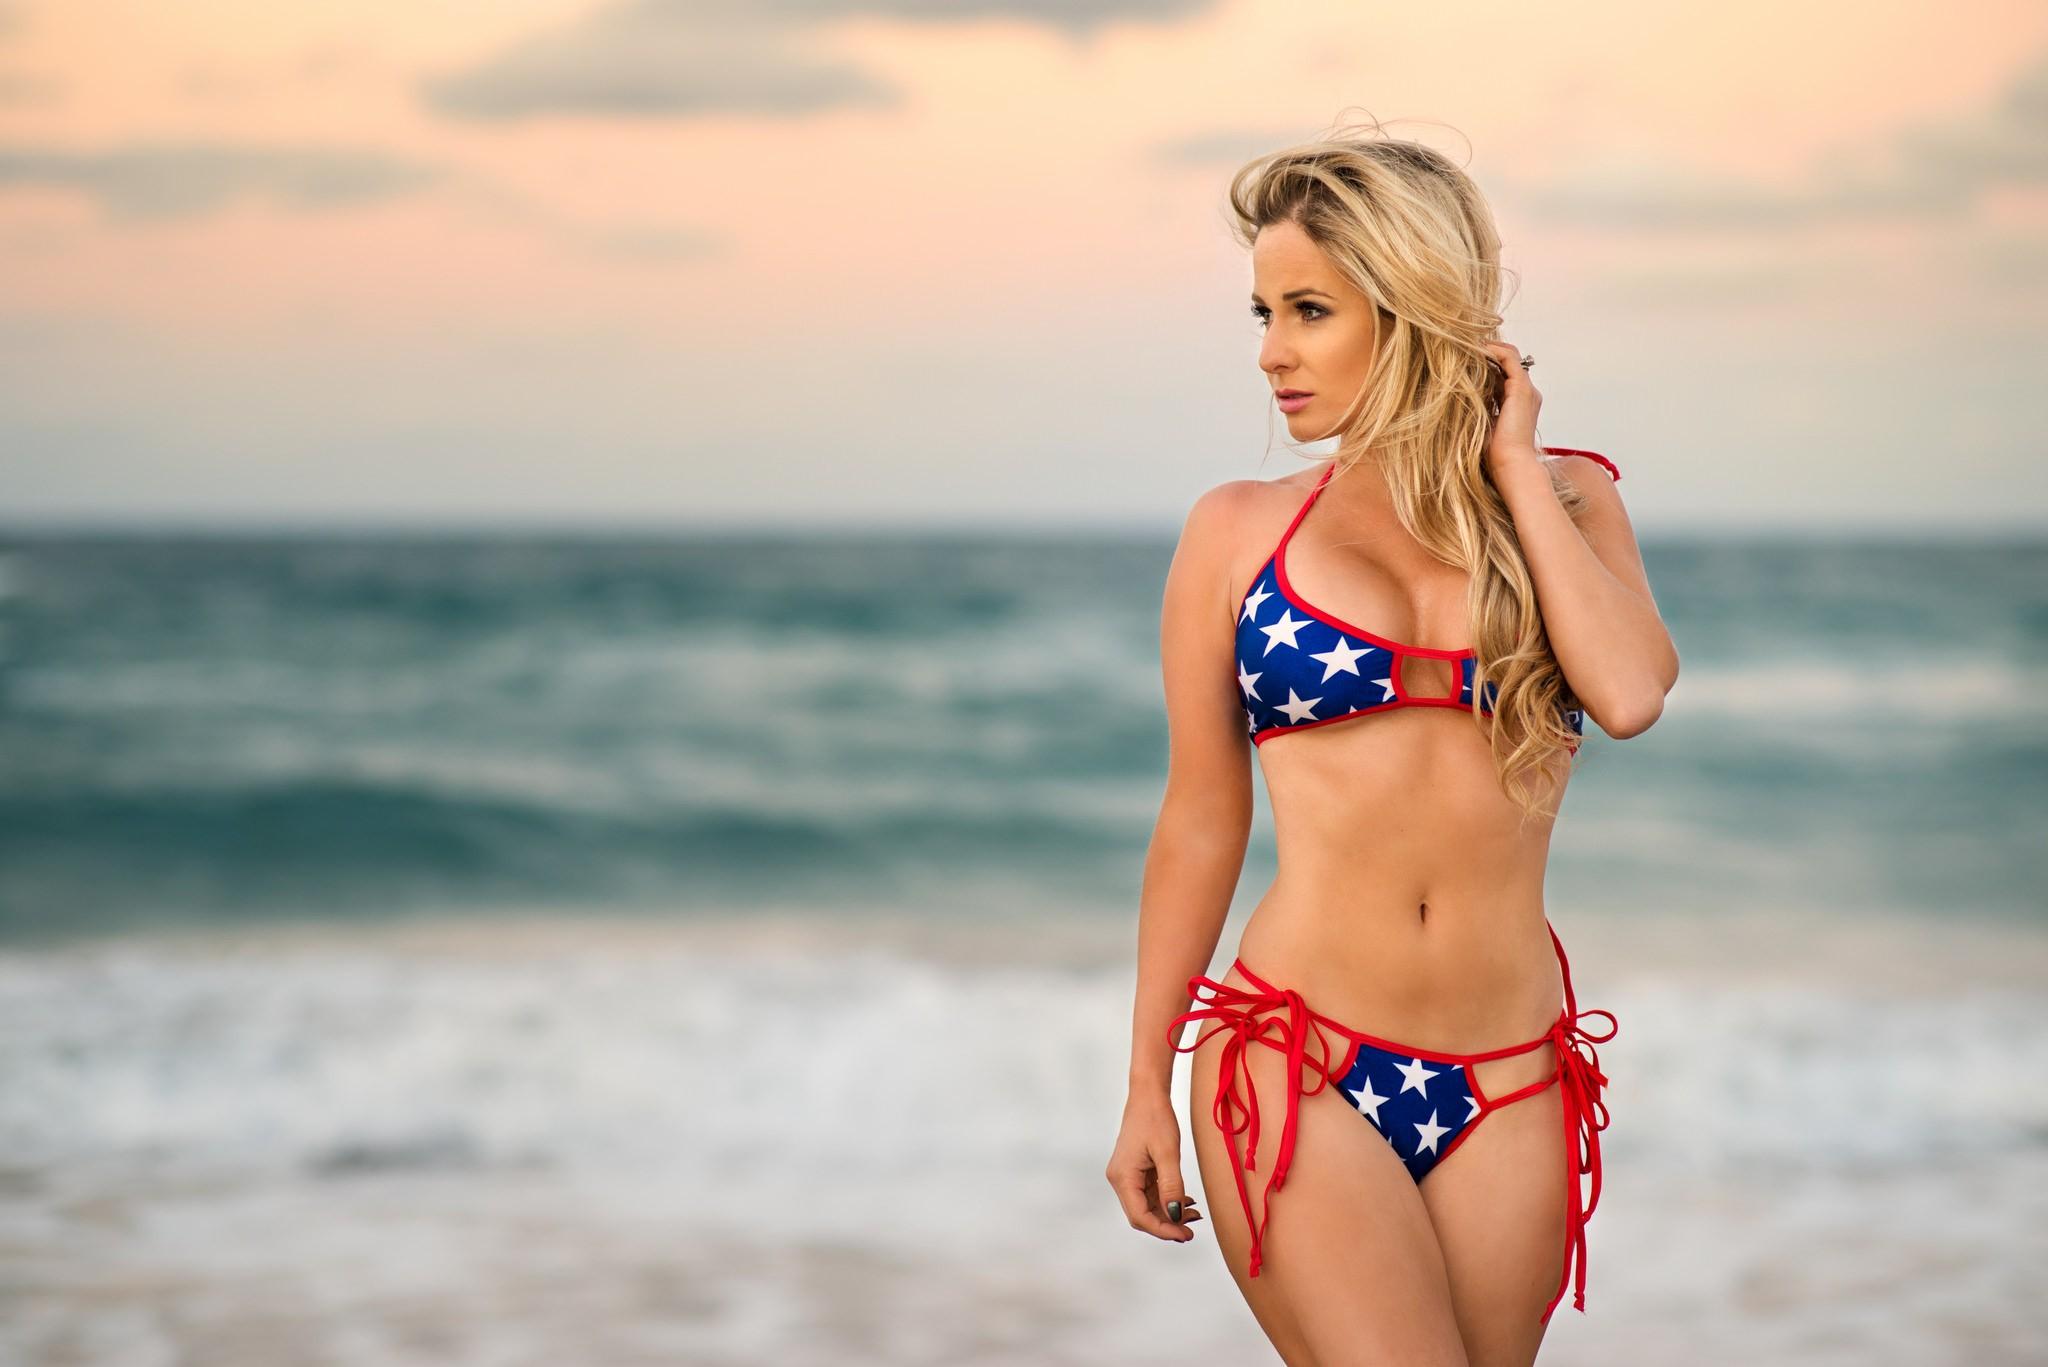 People 2048x1367 women blonde belly bikini sea looking away depth of field hips women outdoors windy brown eyes waves cleavage Lauren Kristina Christopher Rankin